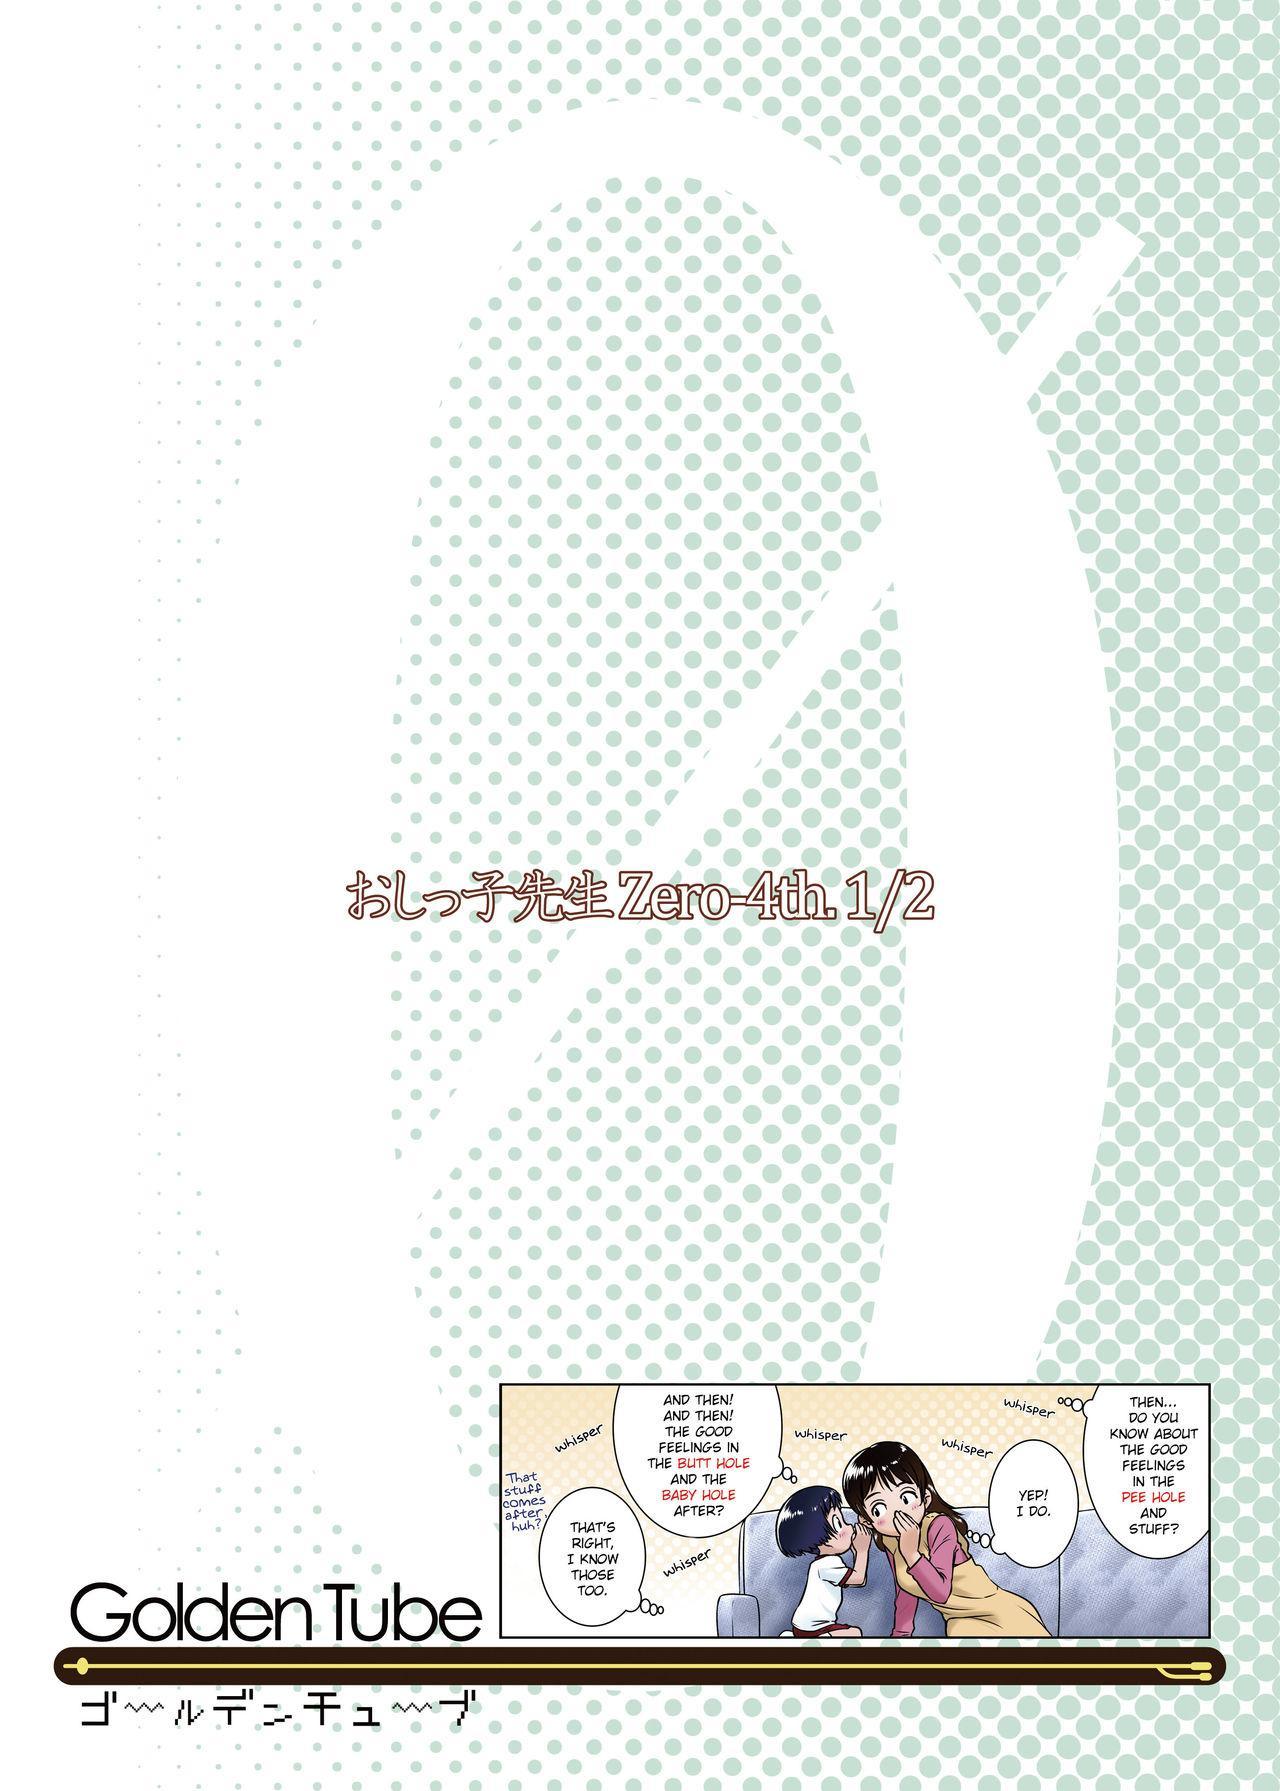 [Golden Tube (Ogu)] 3-sai Kara no Oshikko Sensei -IV Zenpen | Oshikko Sensei From 3 Years Old - IV - Part One [English] [Decensored] [Digital] 27